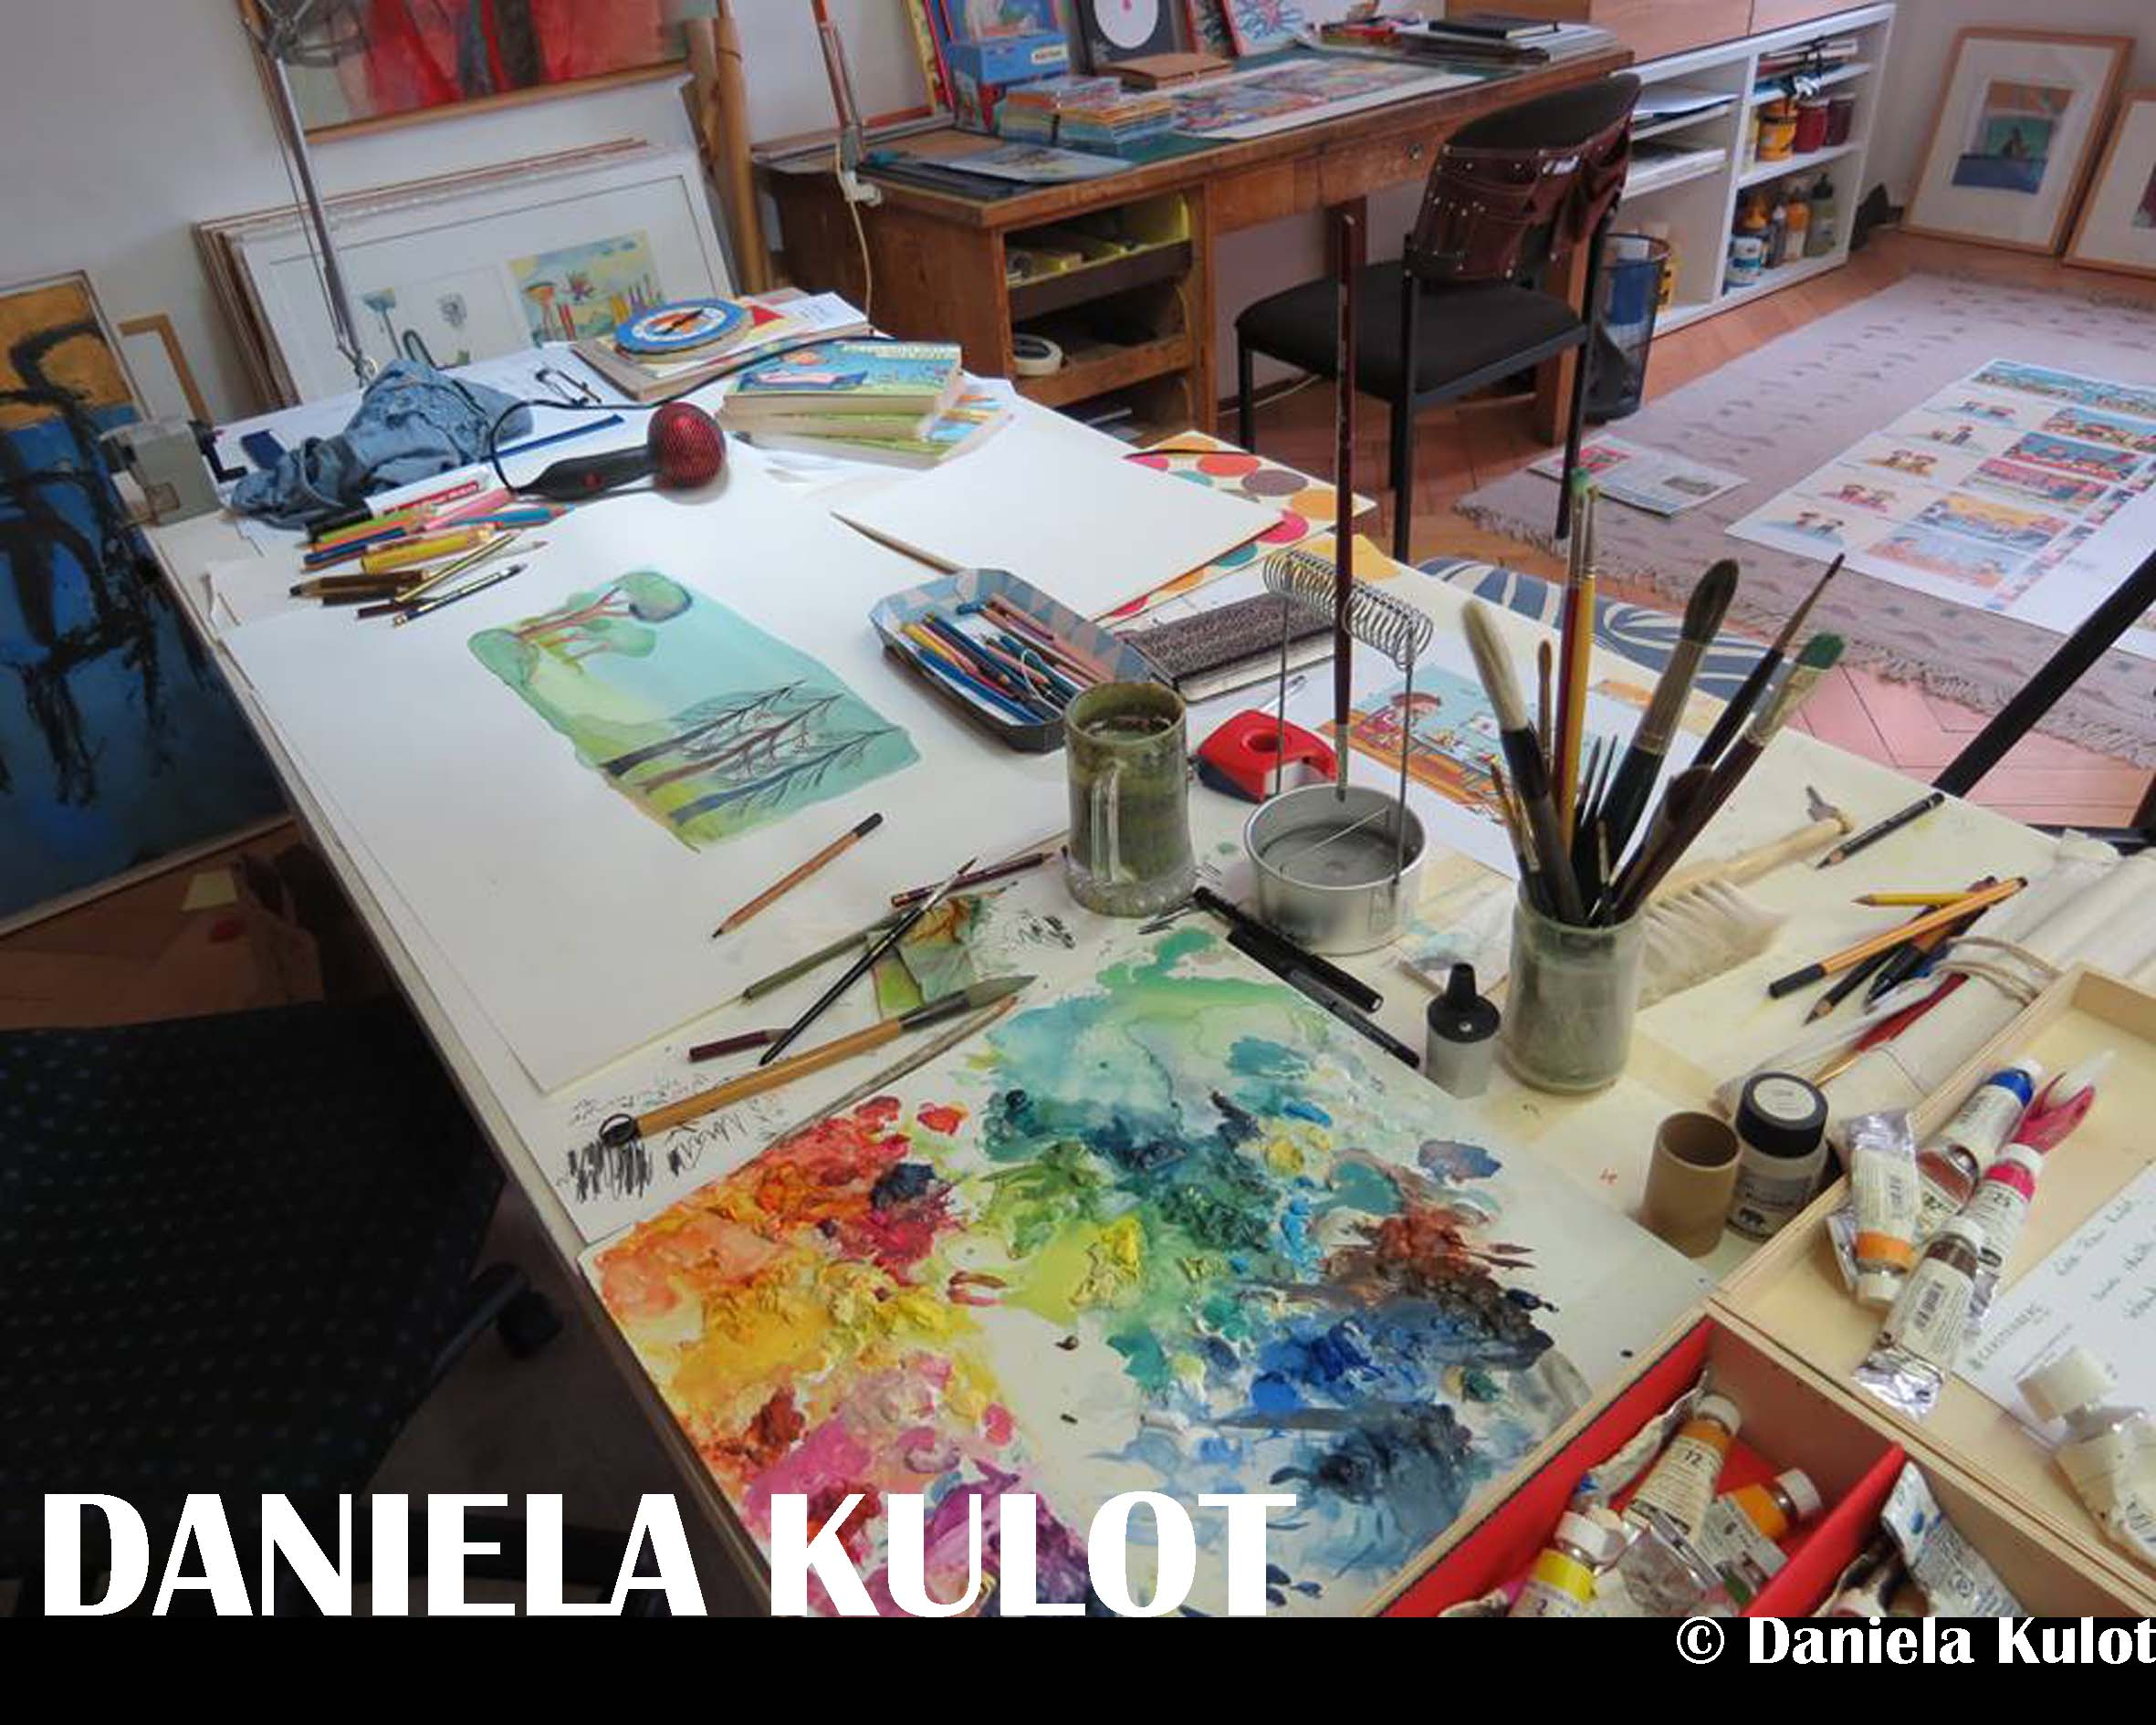 Daniela Kulot